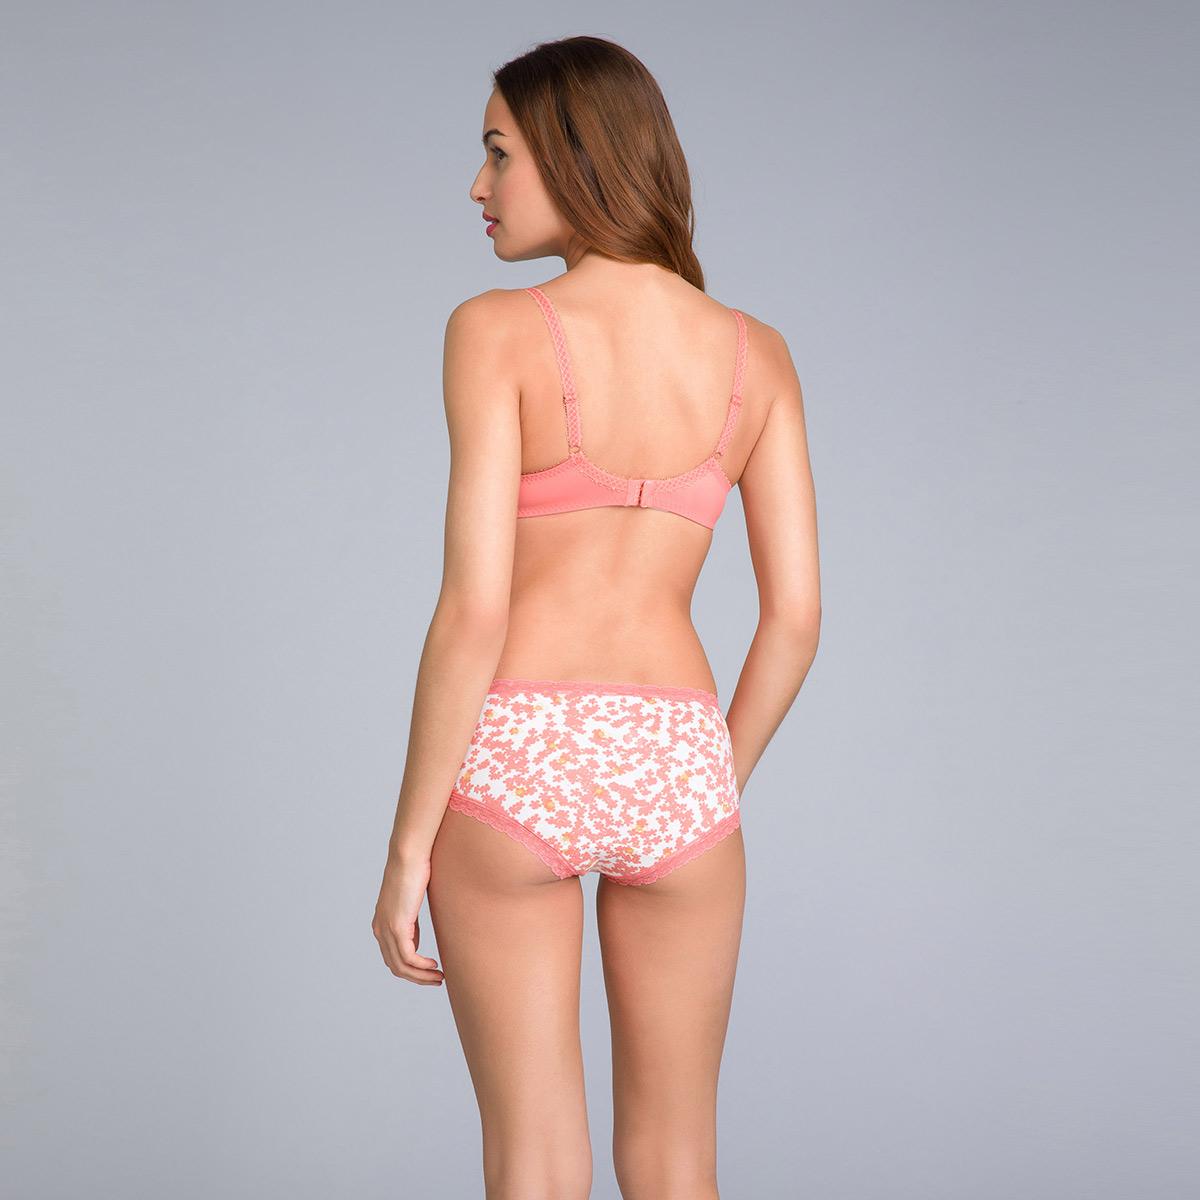 Pack of 2 Shorts in Orange Print - Cotton Fancy - PLAYTEX